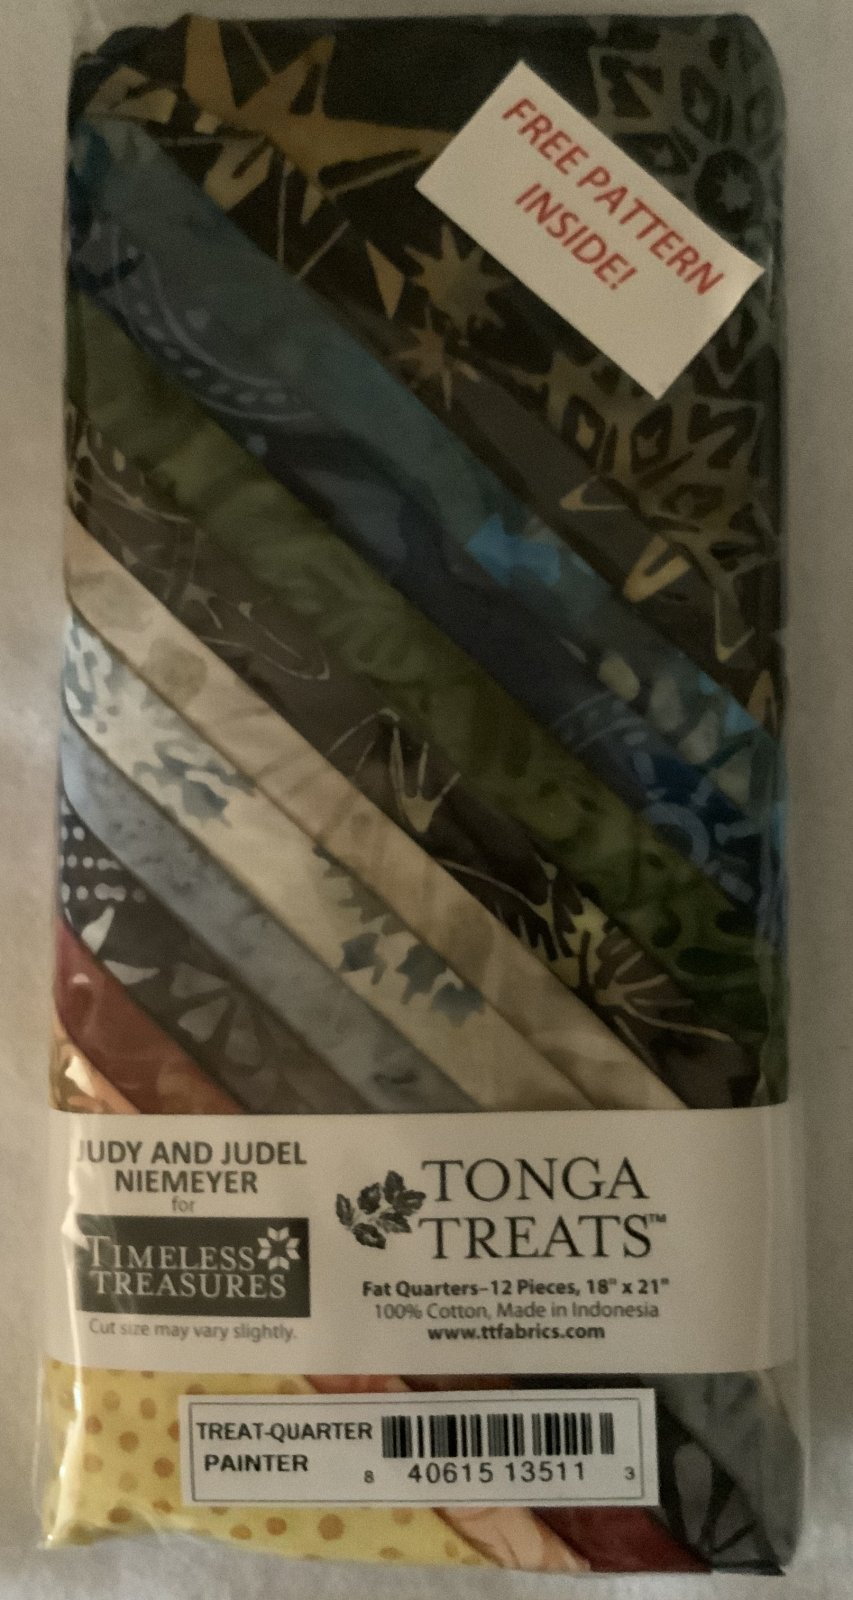 Tonga Treat Fat Quarters Jupiter (18in x 21in) 12pcs - Timeless Treasures